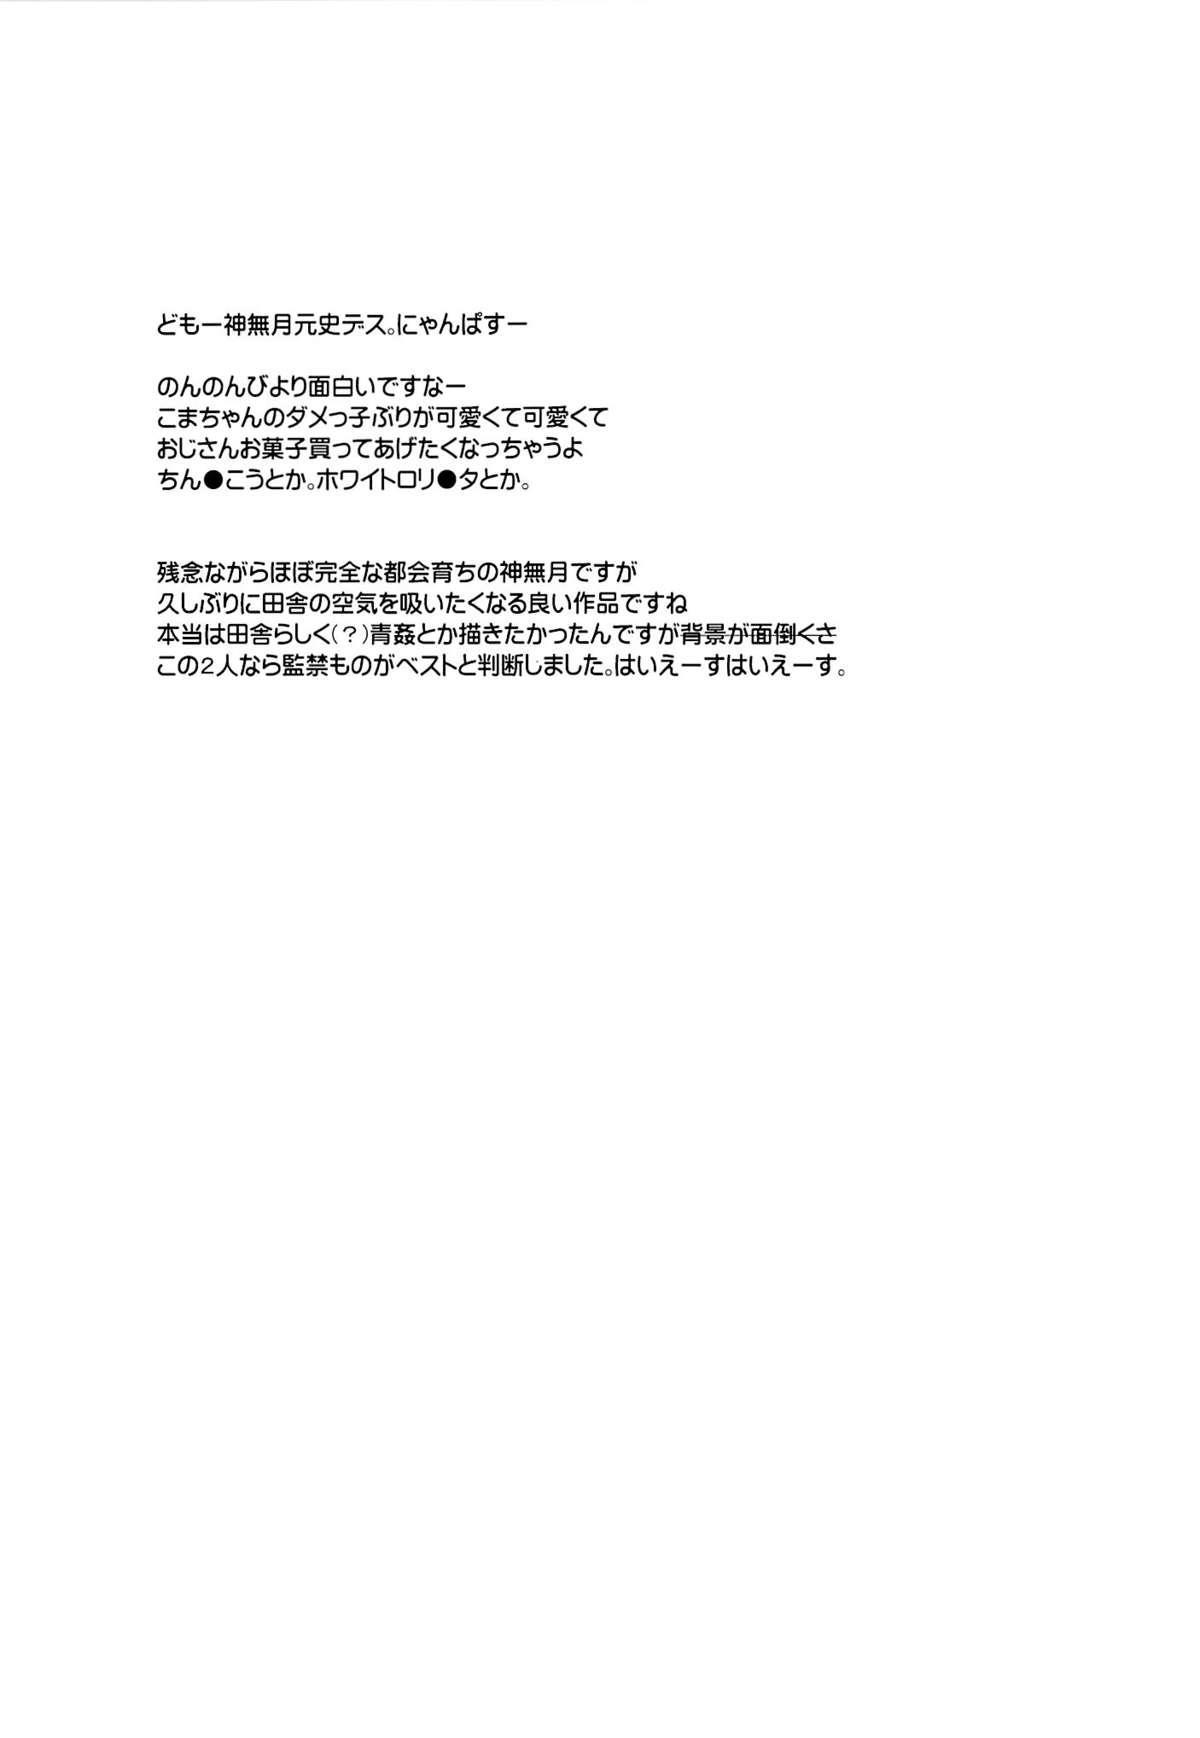 Zun Zun Biyori 2